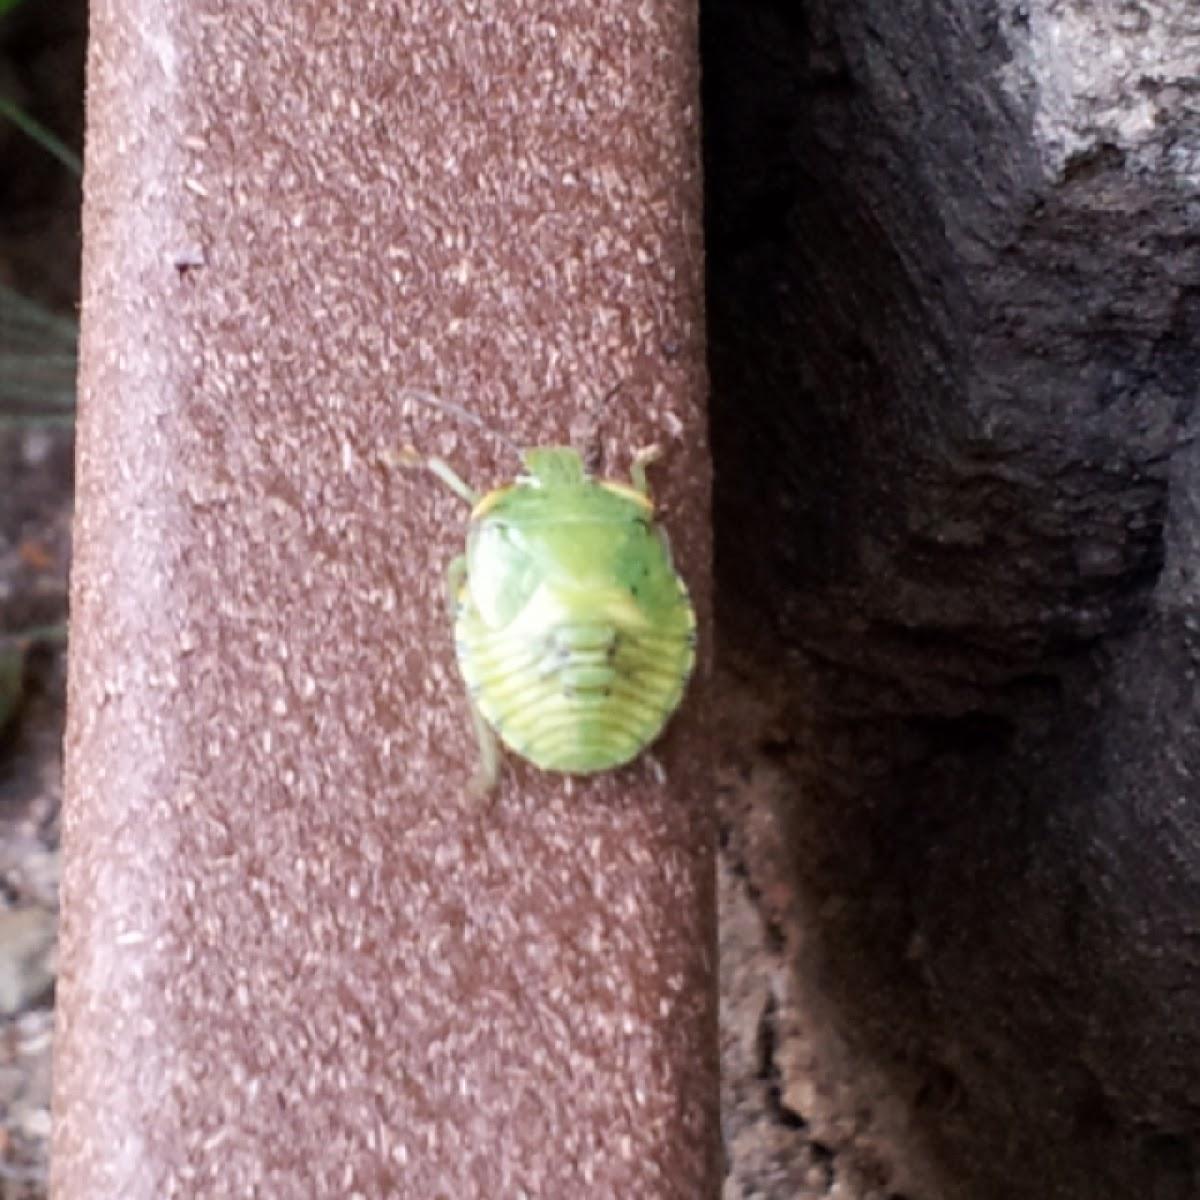 Stink bug nymph green